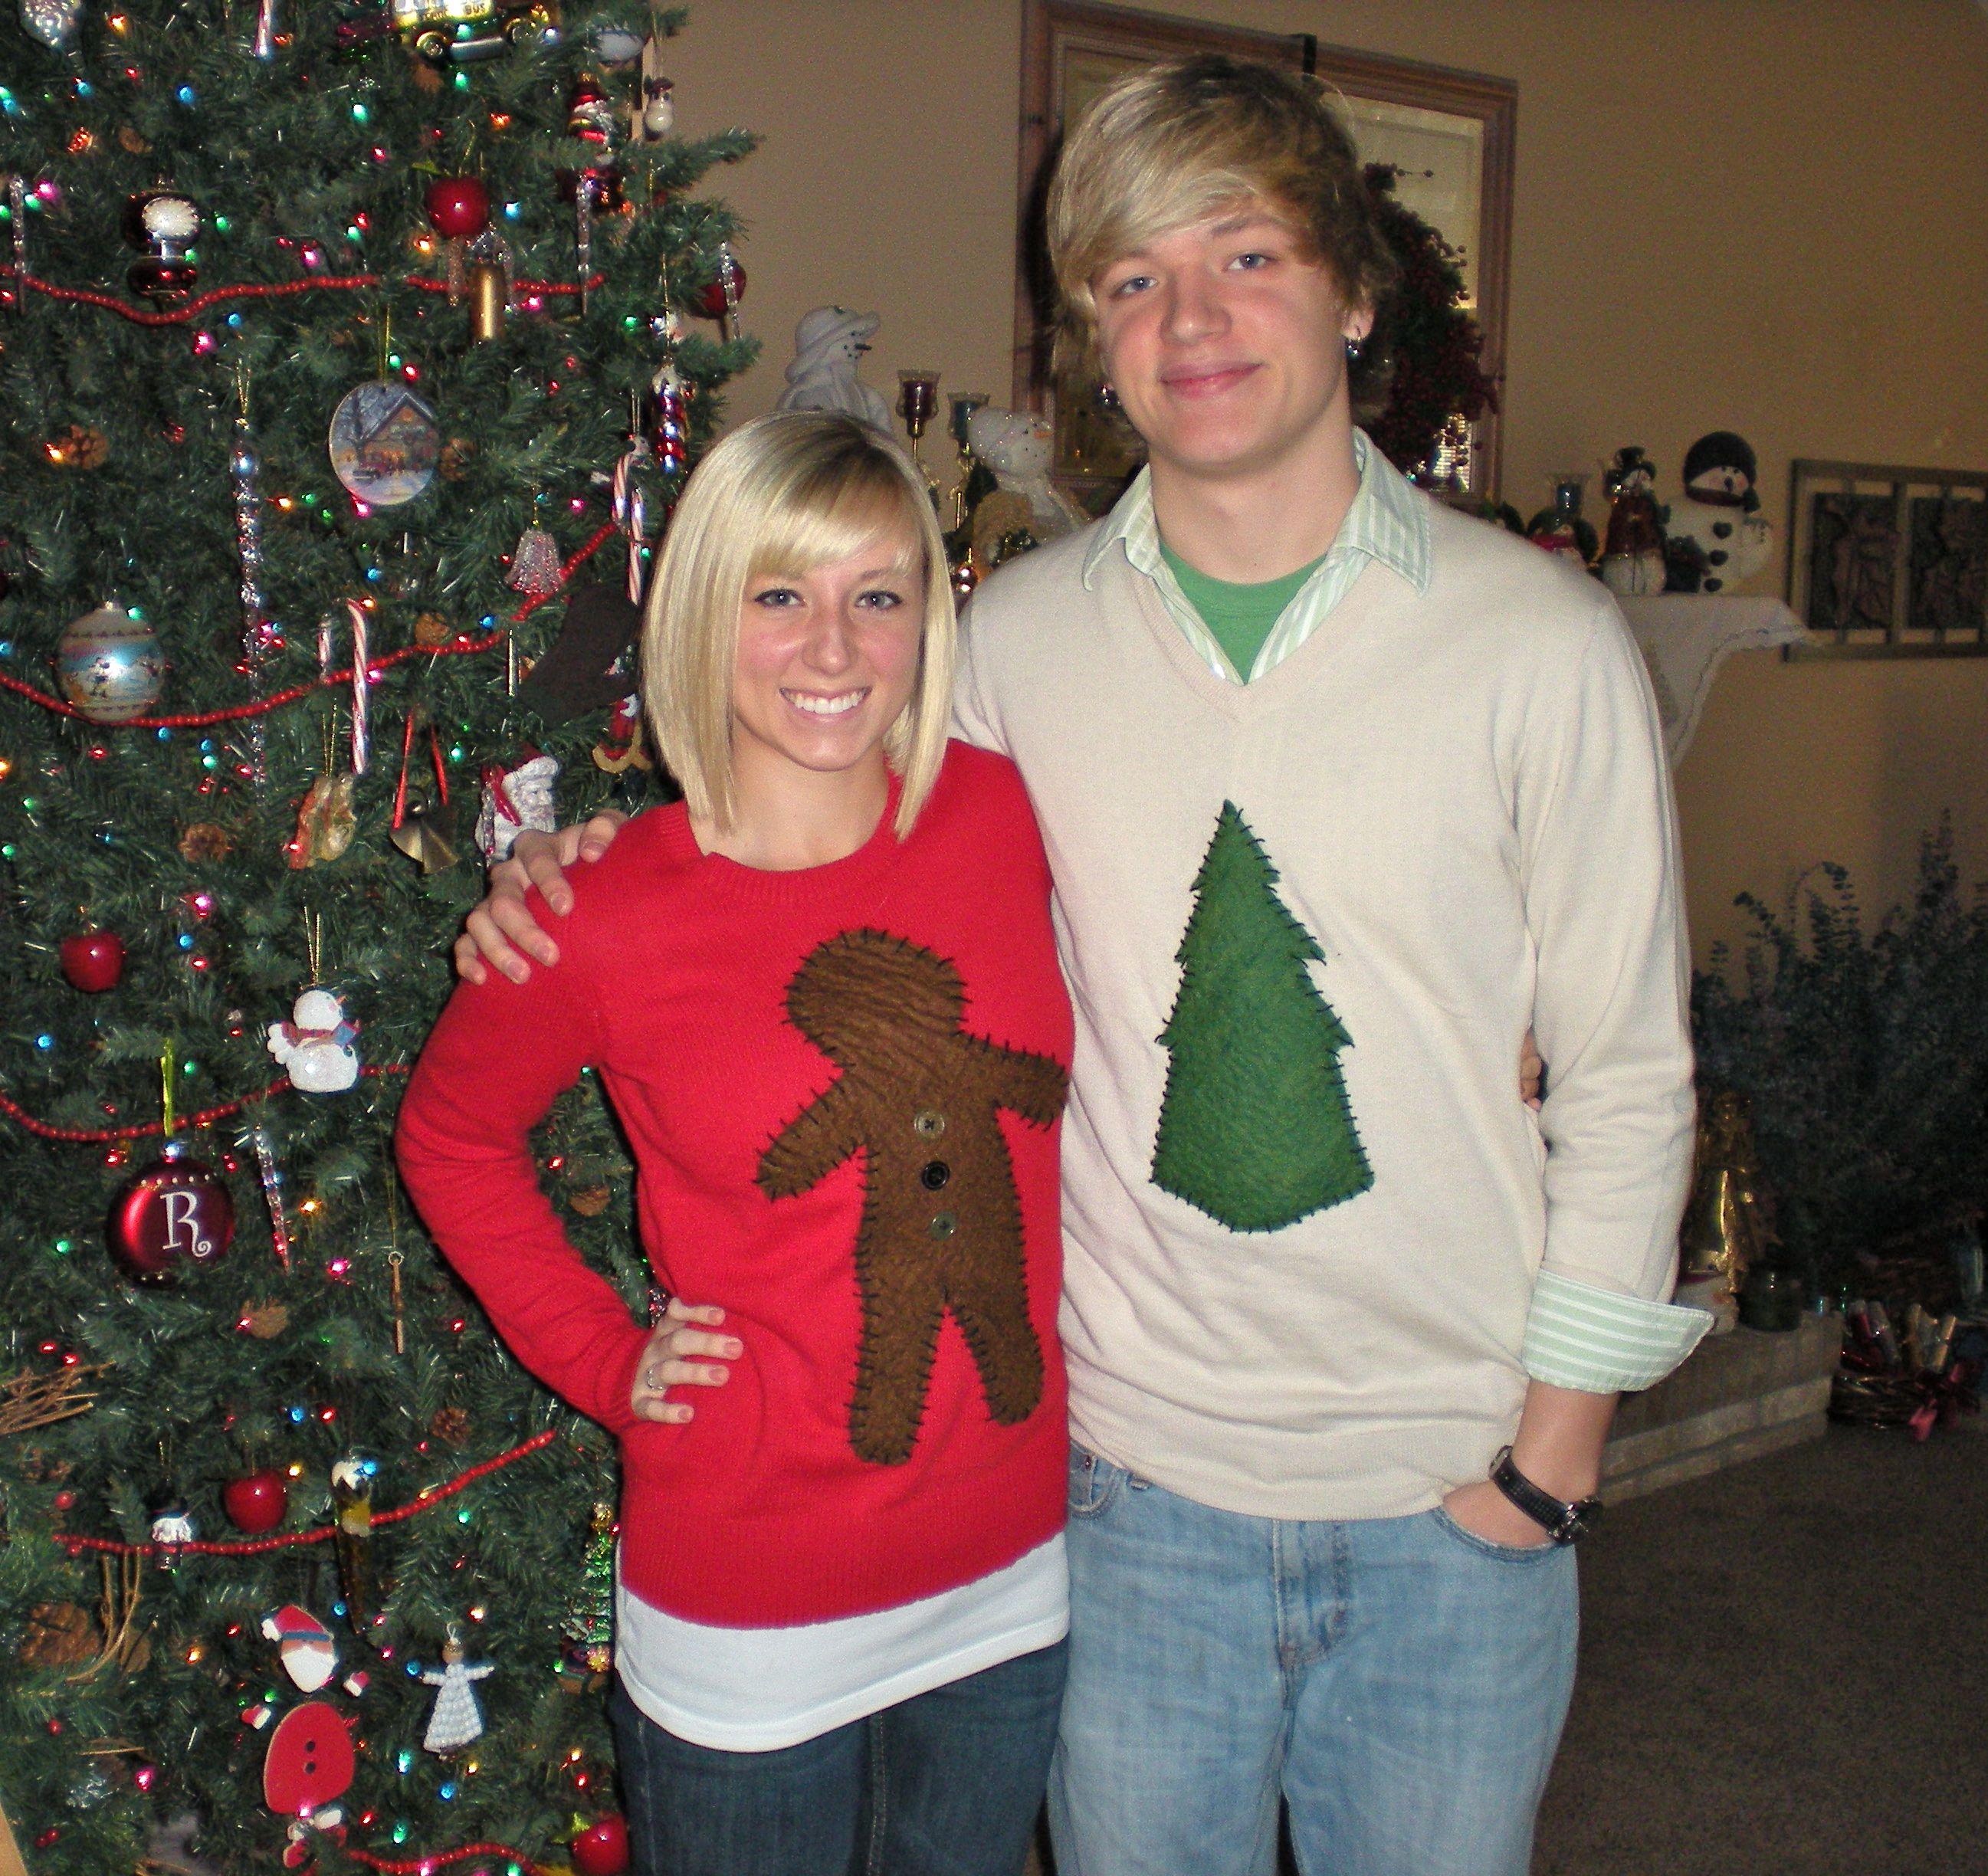 Handmade Christmas sweaters: Old Navy $10 sweaters, some felt, black ...